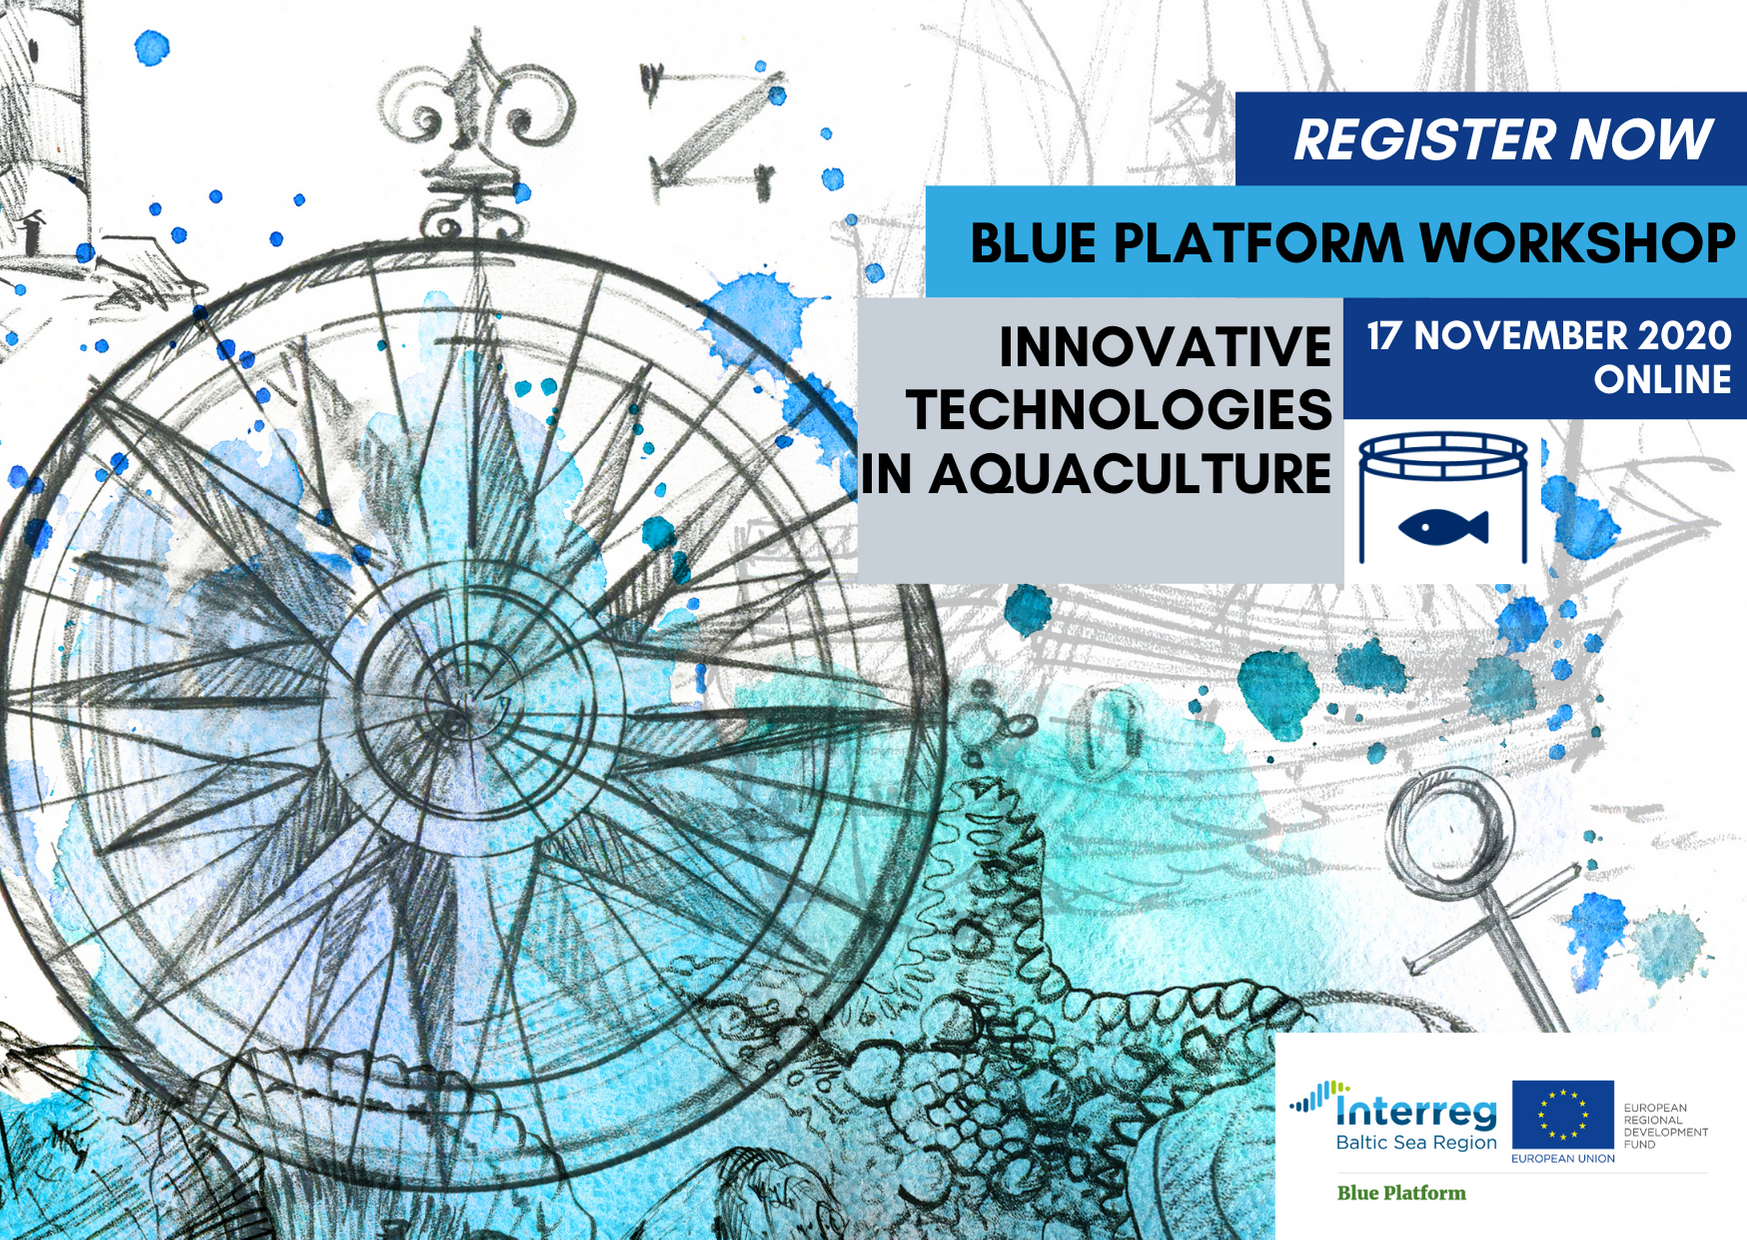 Blue_Platform_Aquaculture_Technologies_Workshop.png